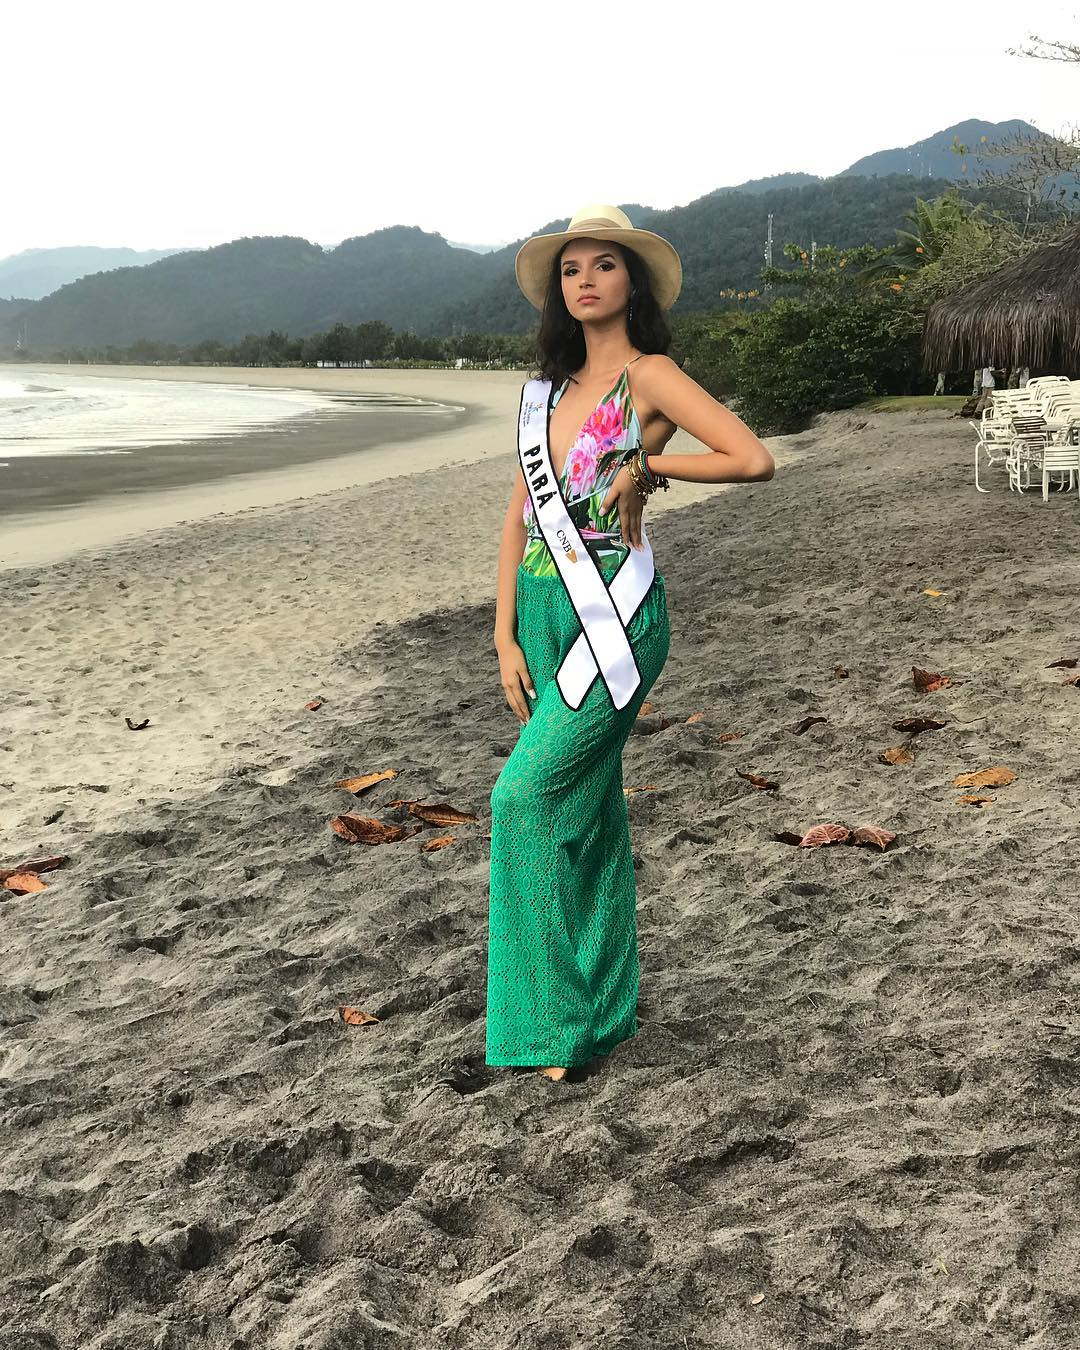 isabella garcia, top 8 de miss brasil mundo 2018/top 20 de miss brasil mundo 2019. - Página 2 38254310